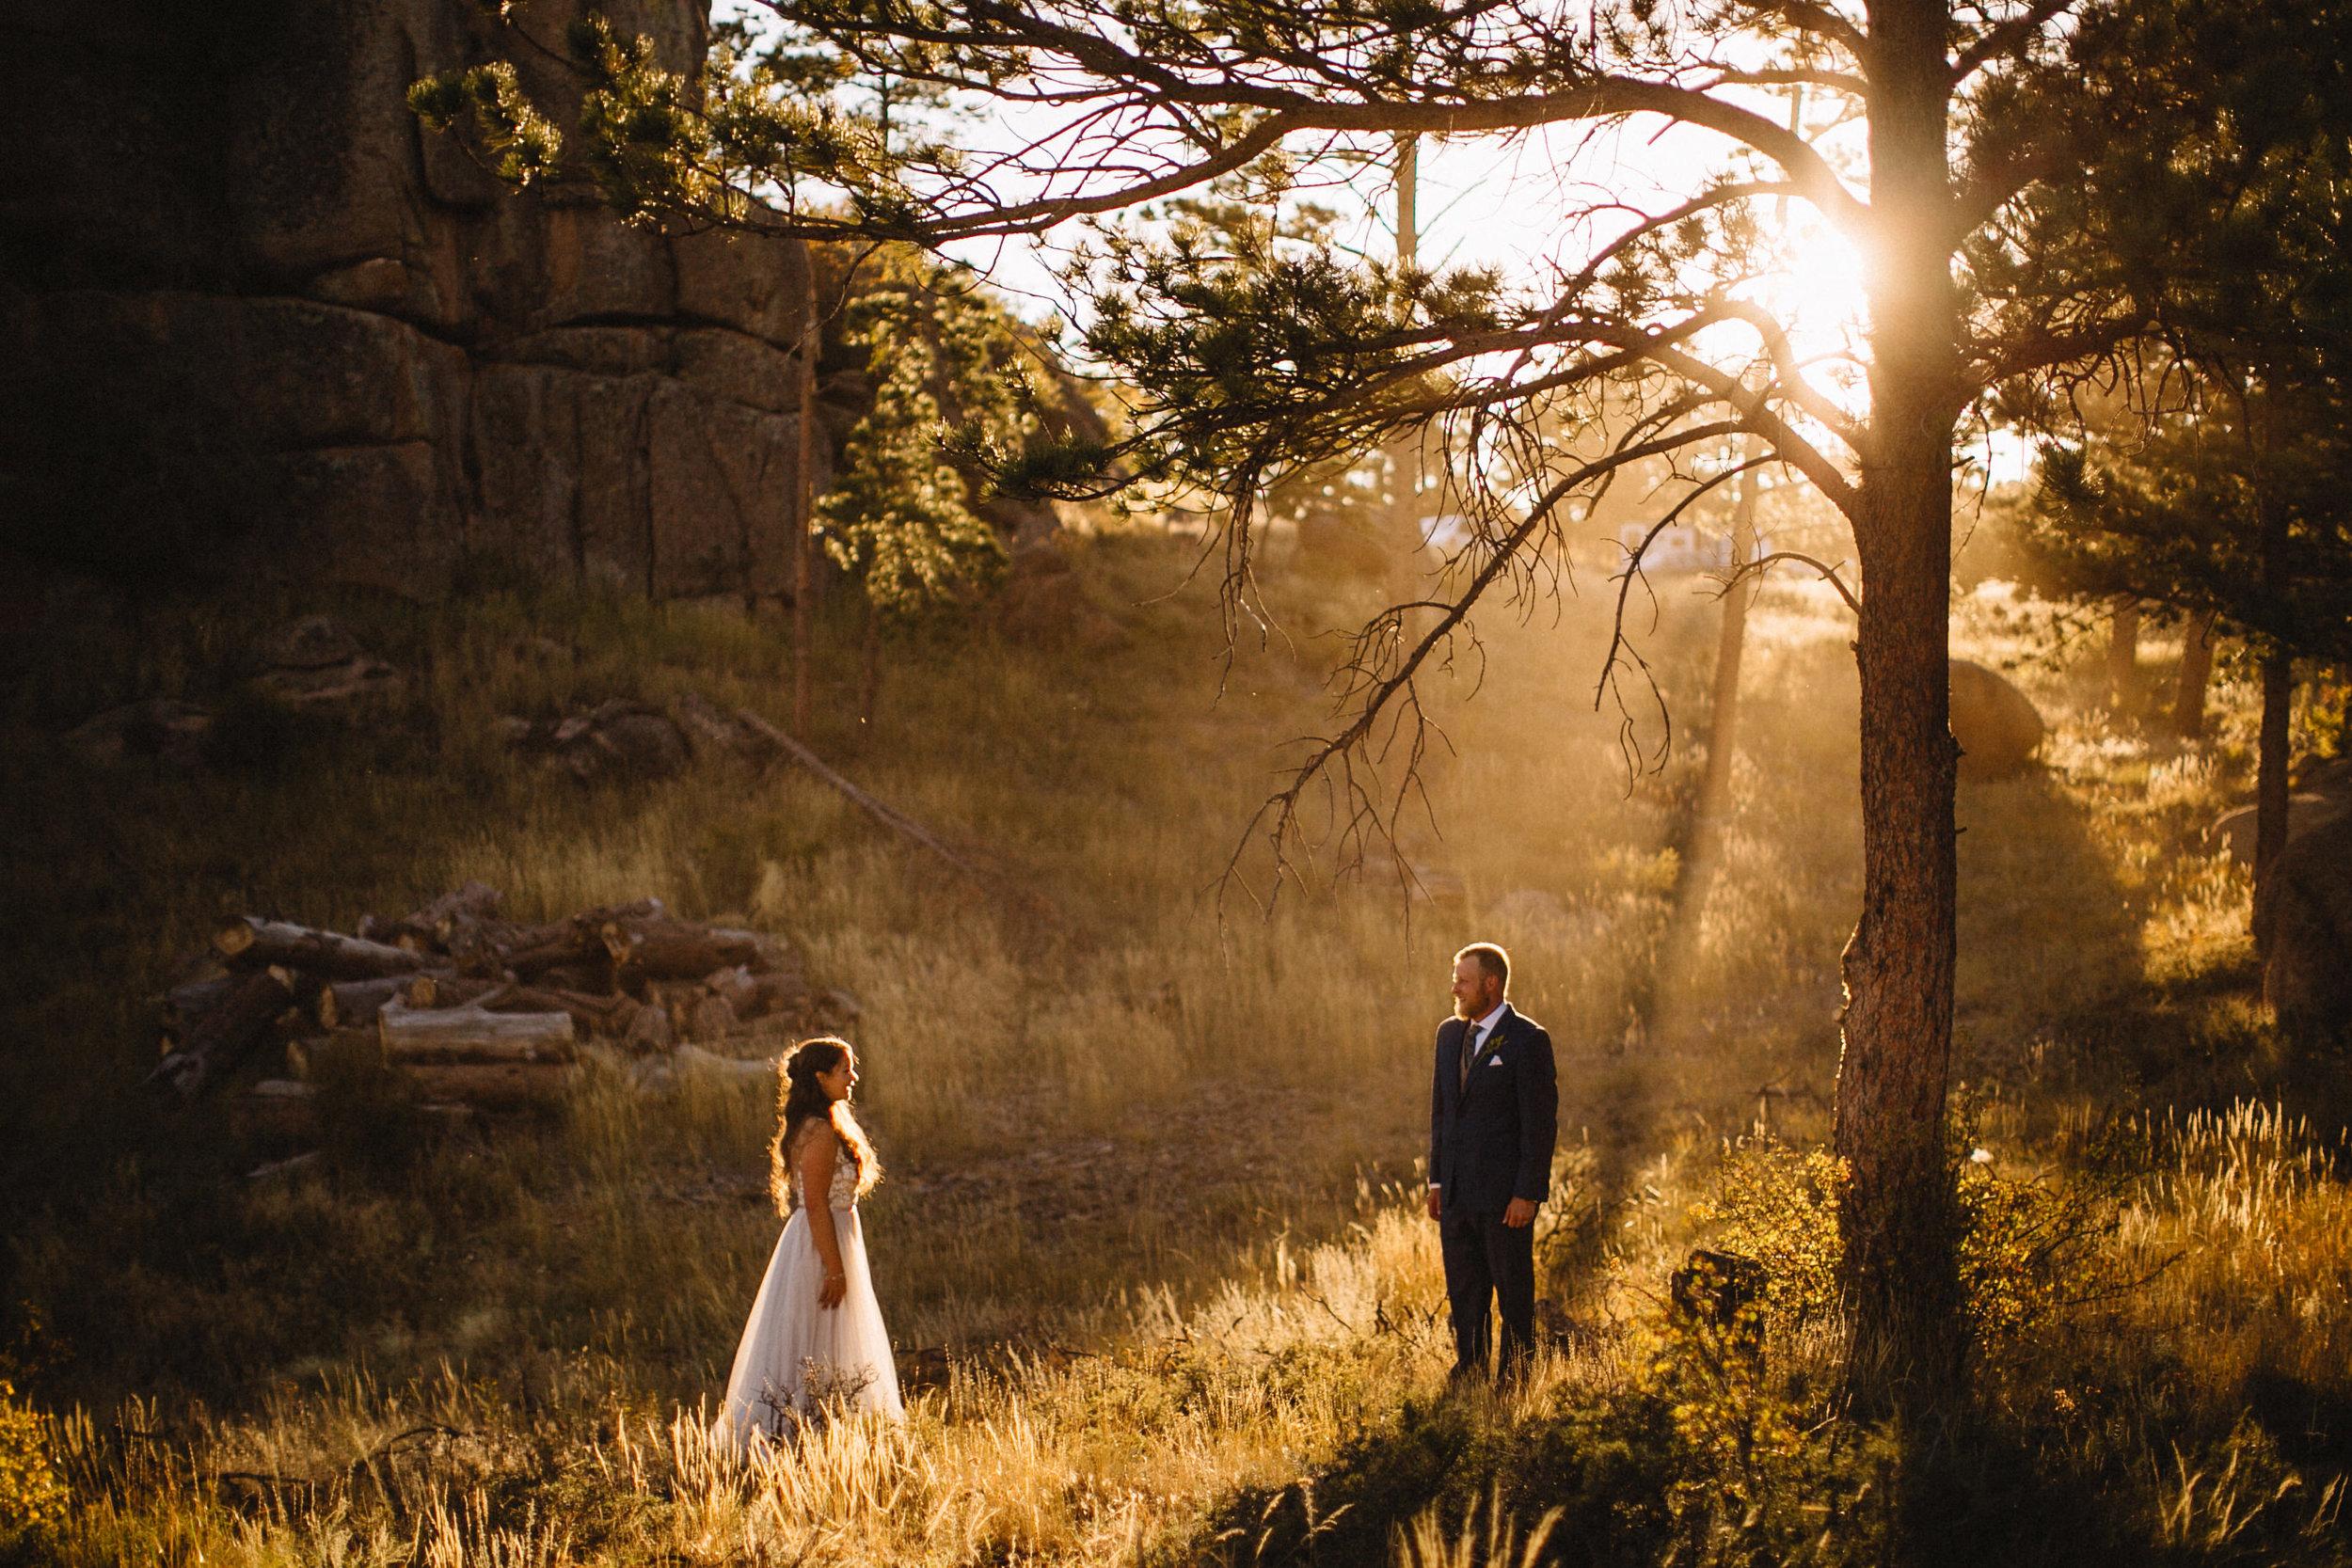 Liz Osban Photography Vedauwoo Buford Wyoming Happy Jack Wedding Elopement Destination Small Forest Cheyenne Laramie Medicine Bow National Forest Portraits Sarah Taylor25.jpg